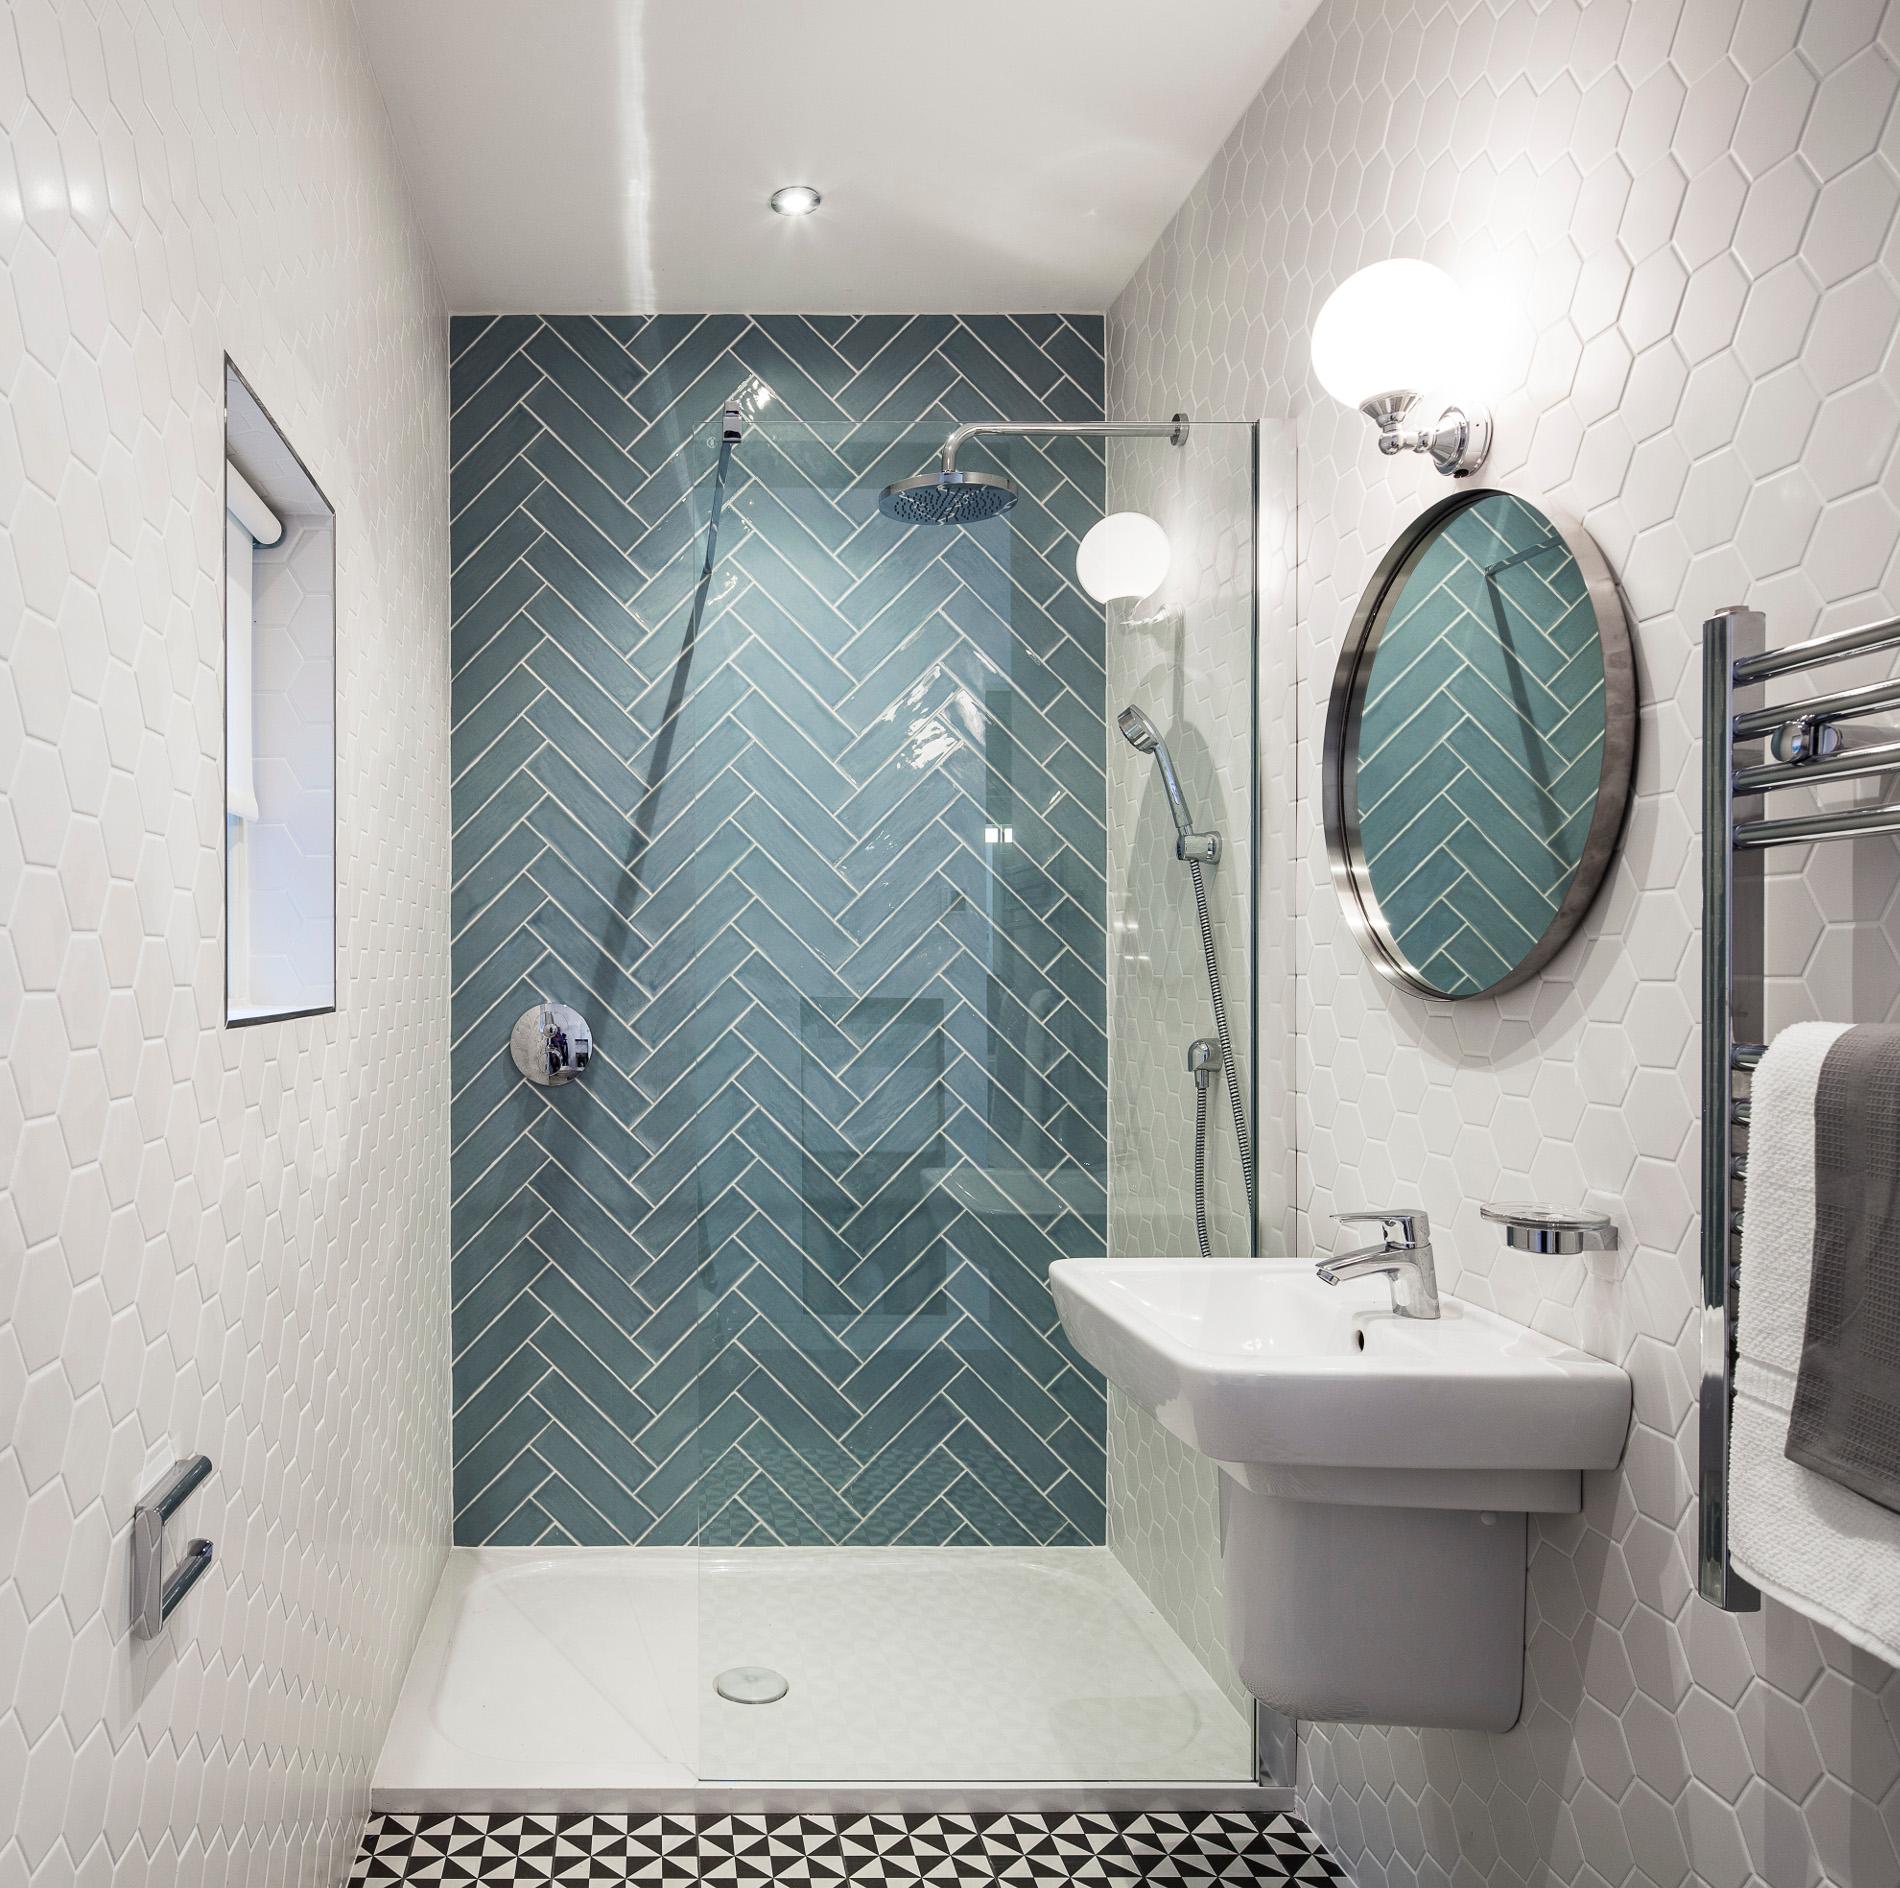 3 tips how to mix and match tiles in bathroom - Viskas apie interjerą